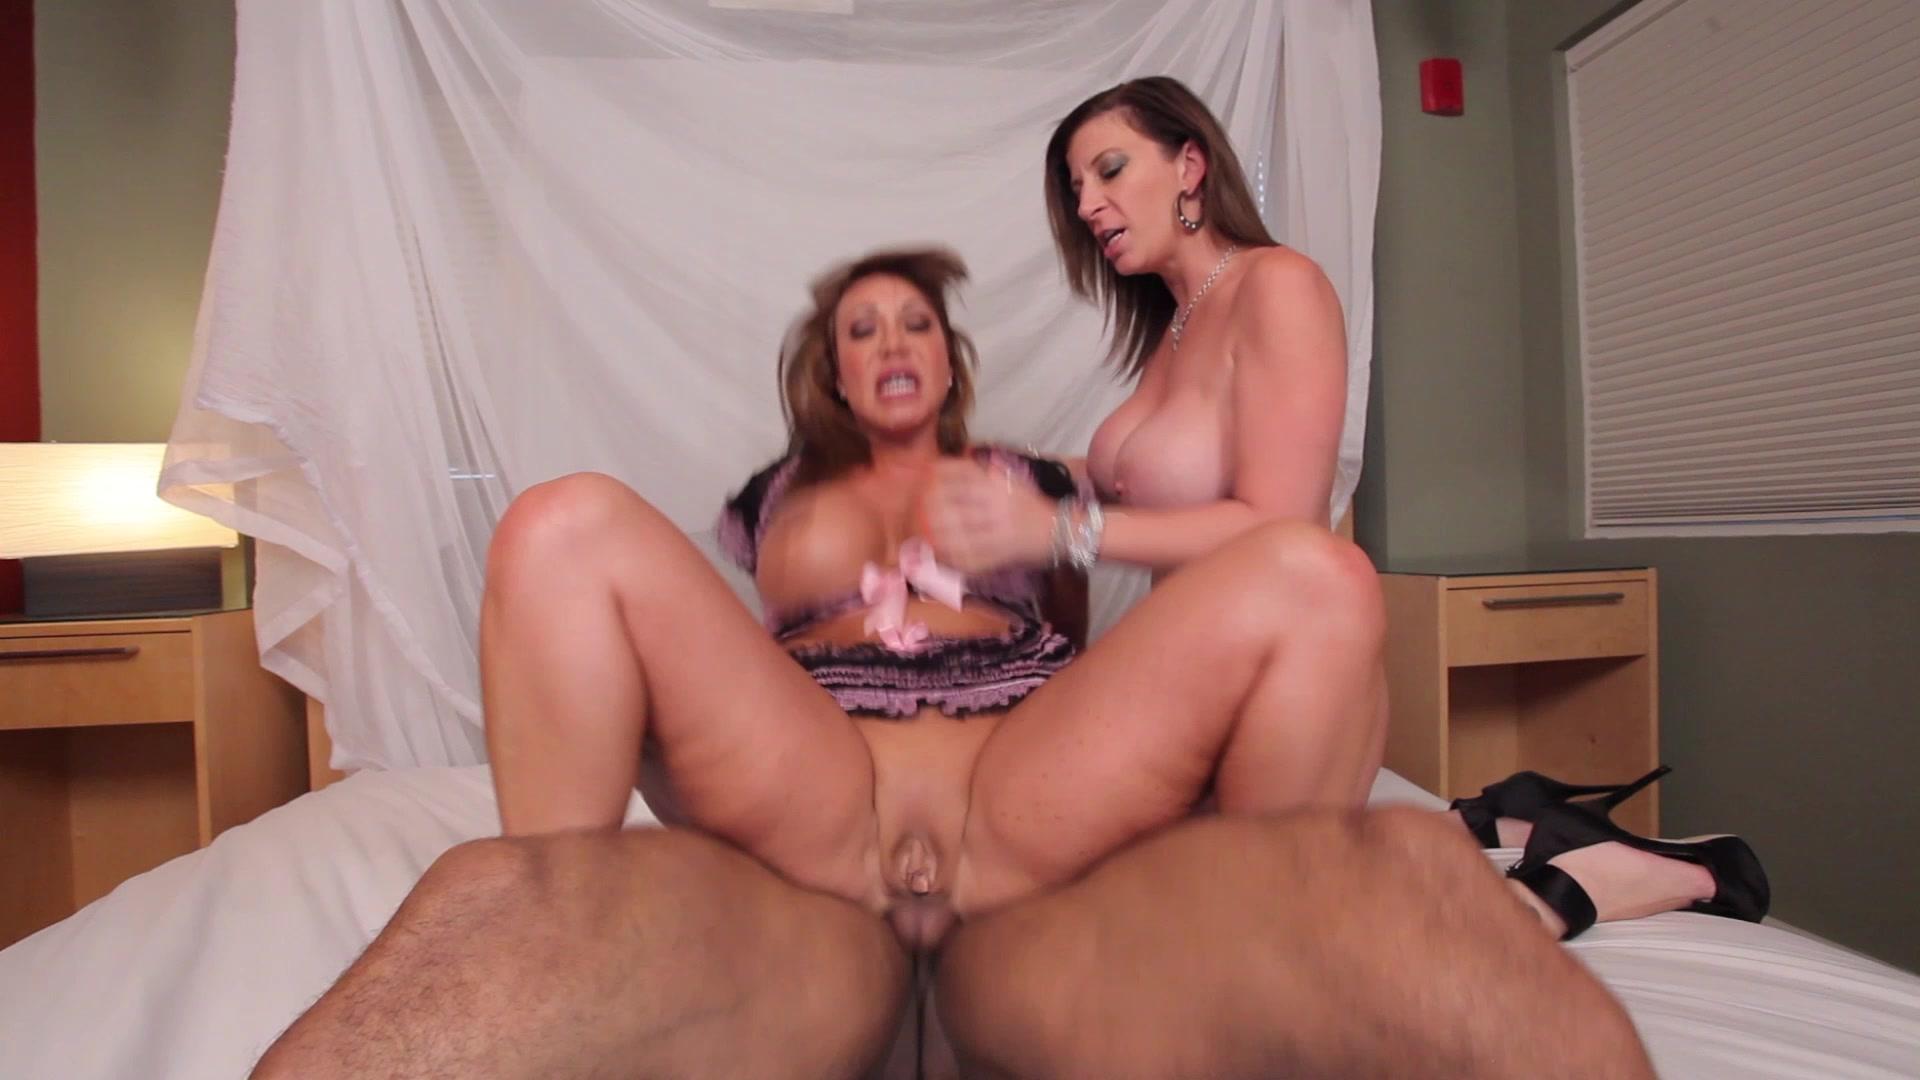 sara jay free sex video